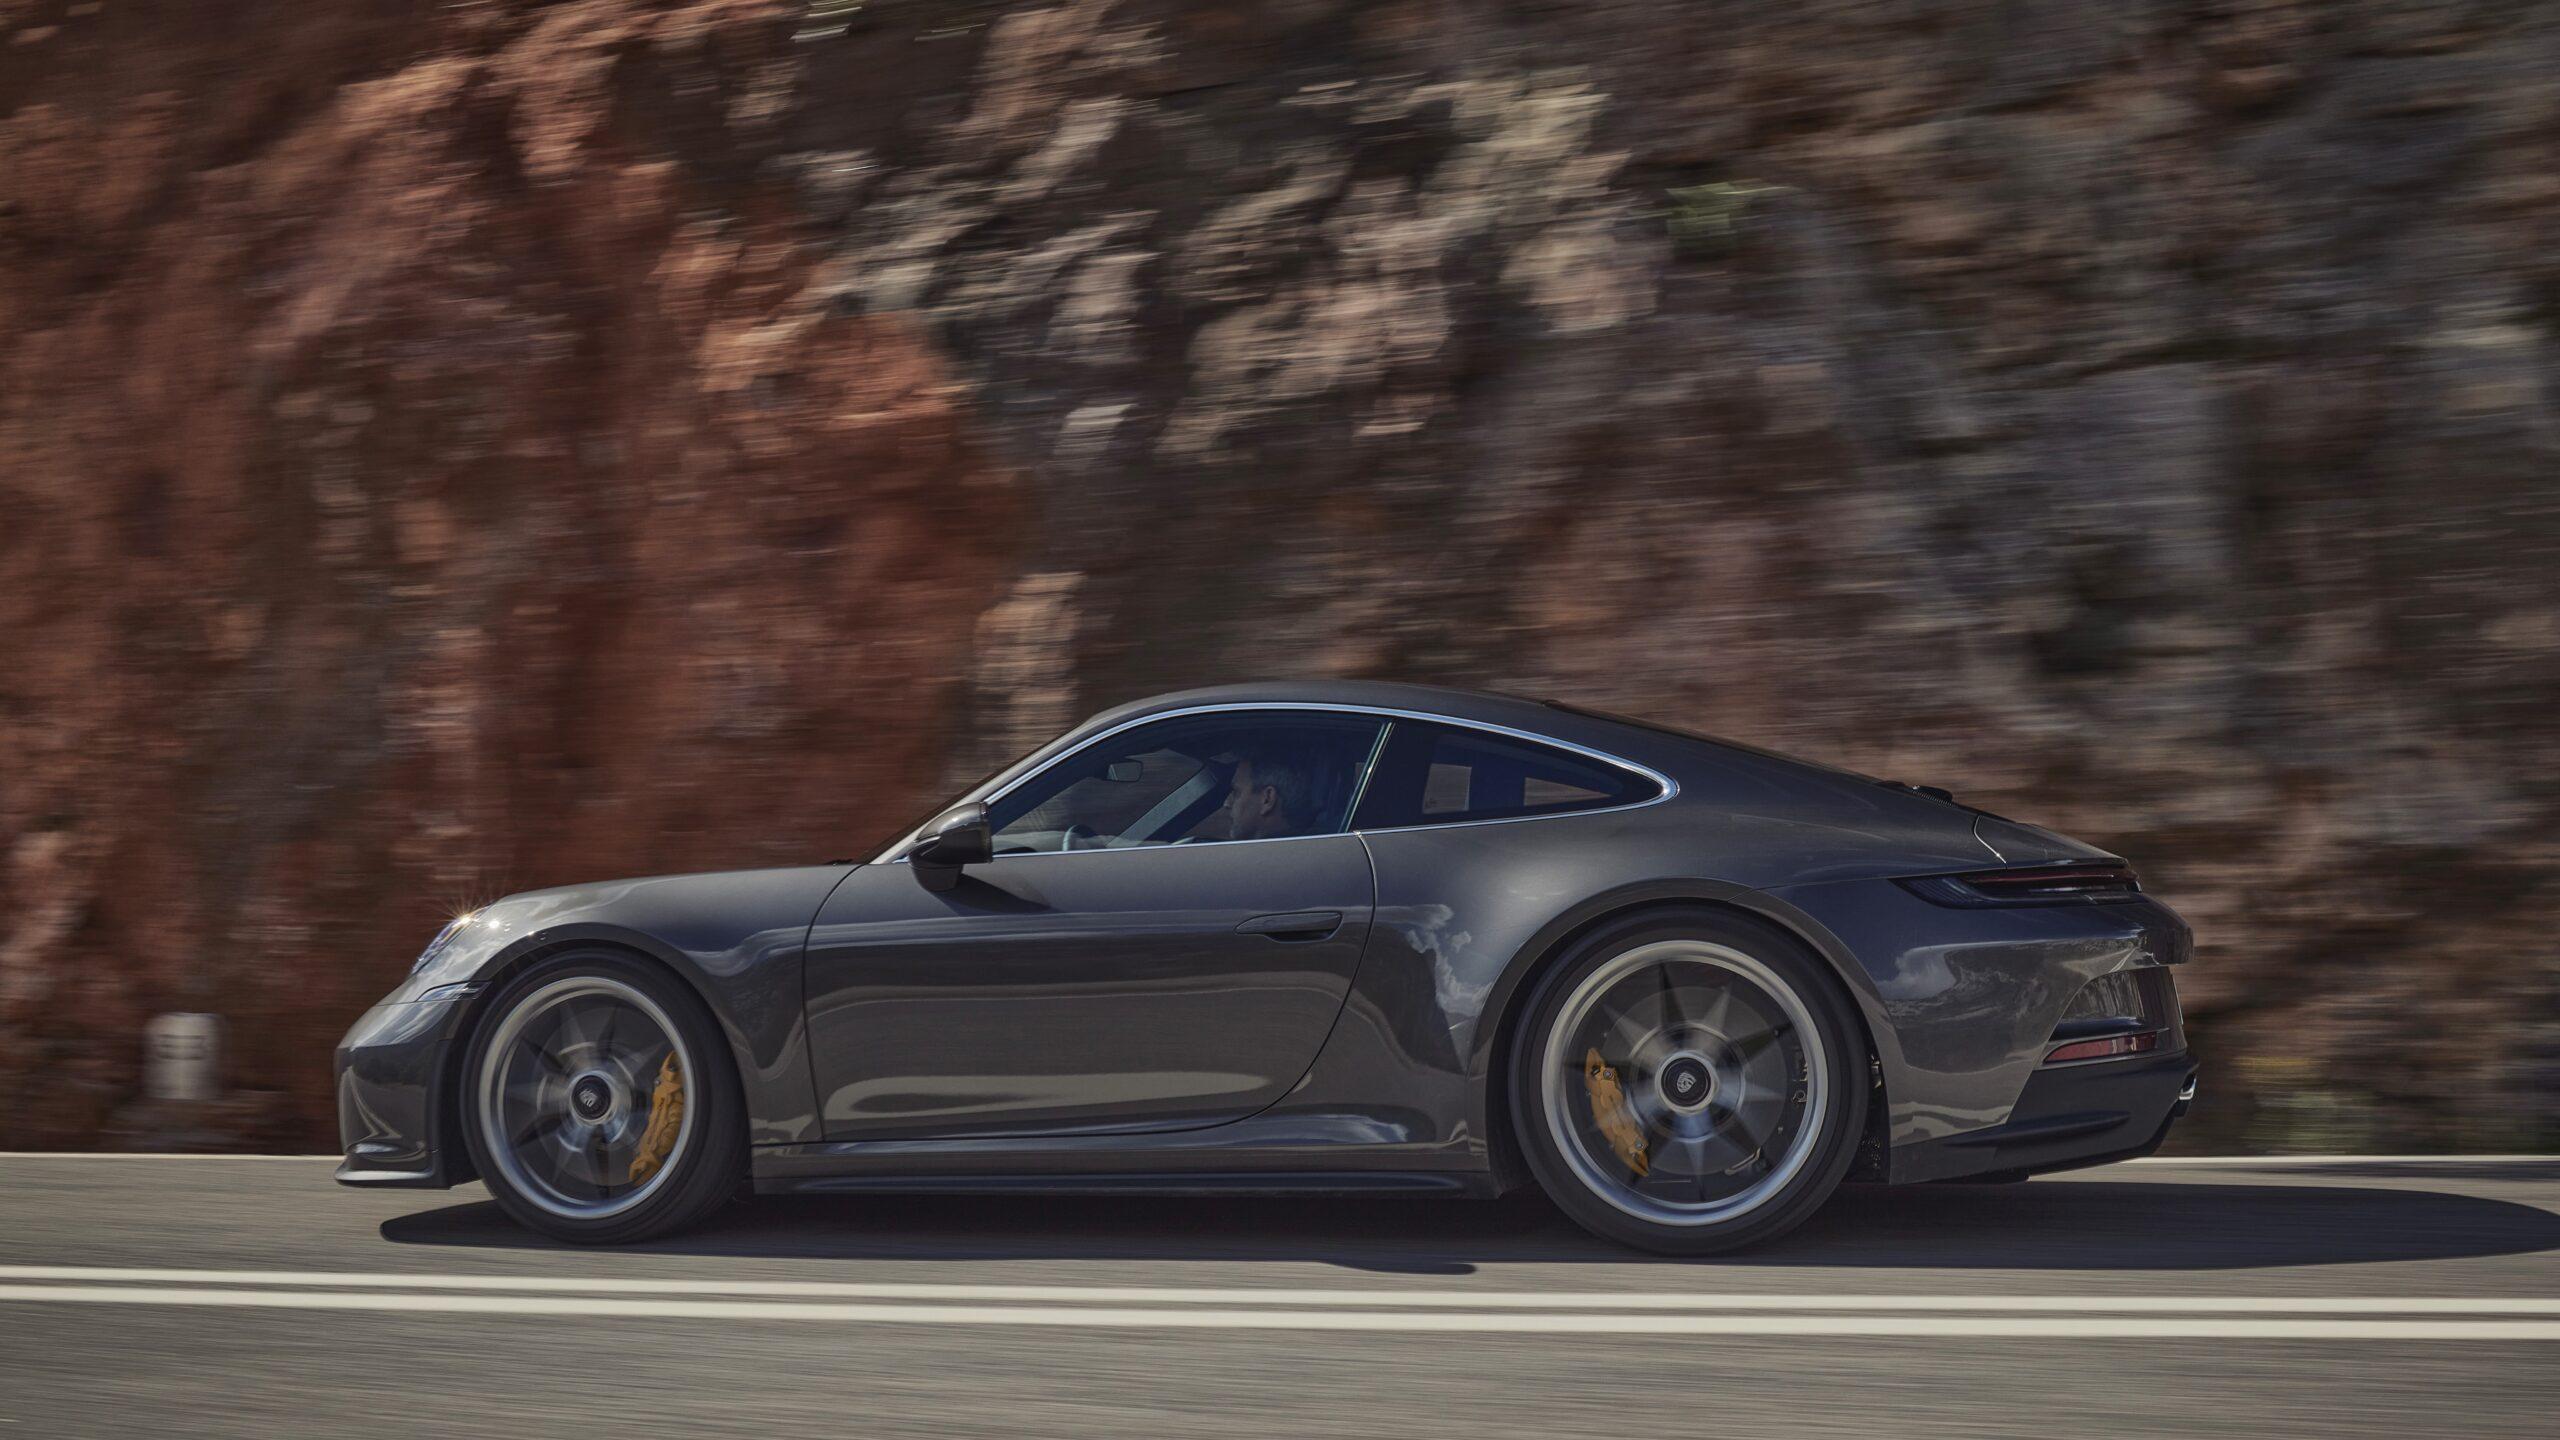 Porsche GT3 Touring Side View